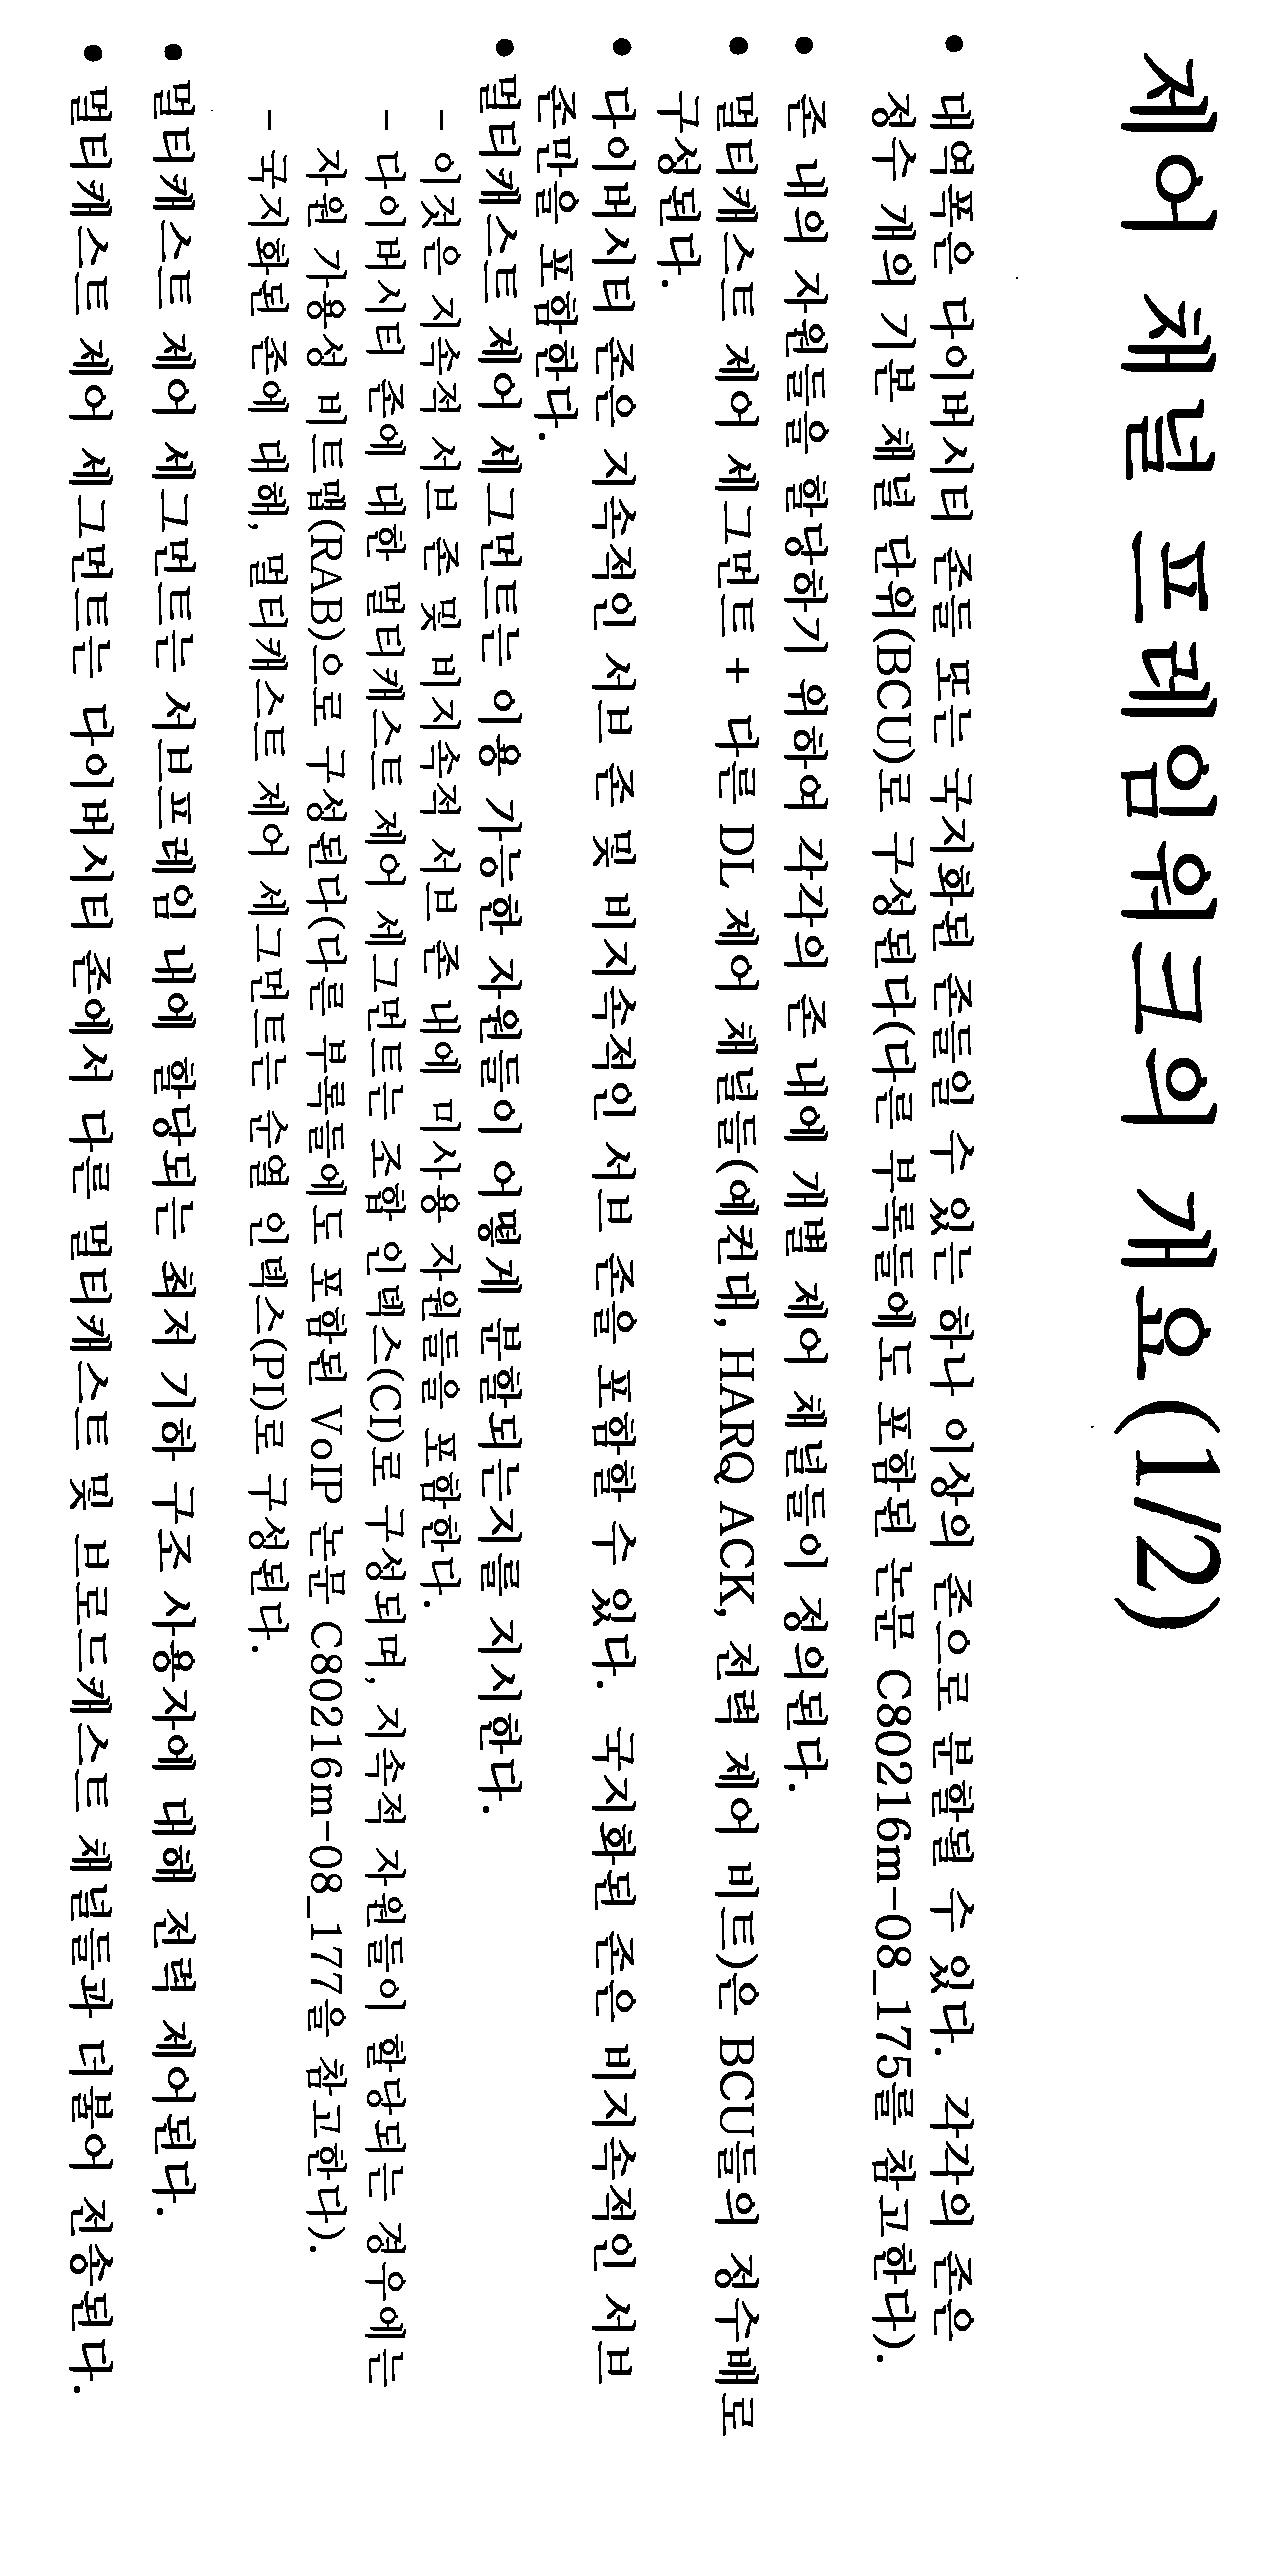 Figure 112014031700415-pat00028